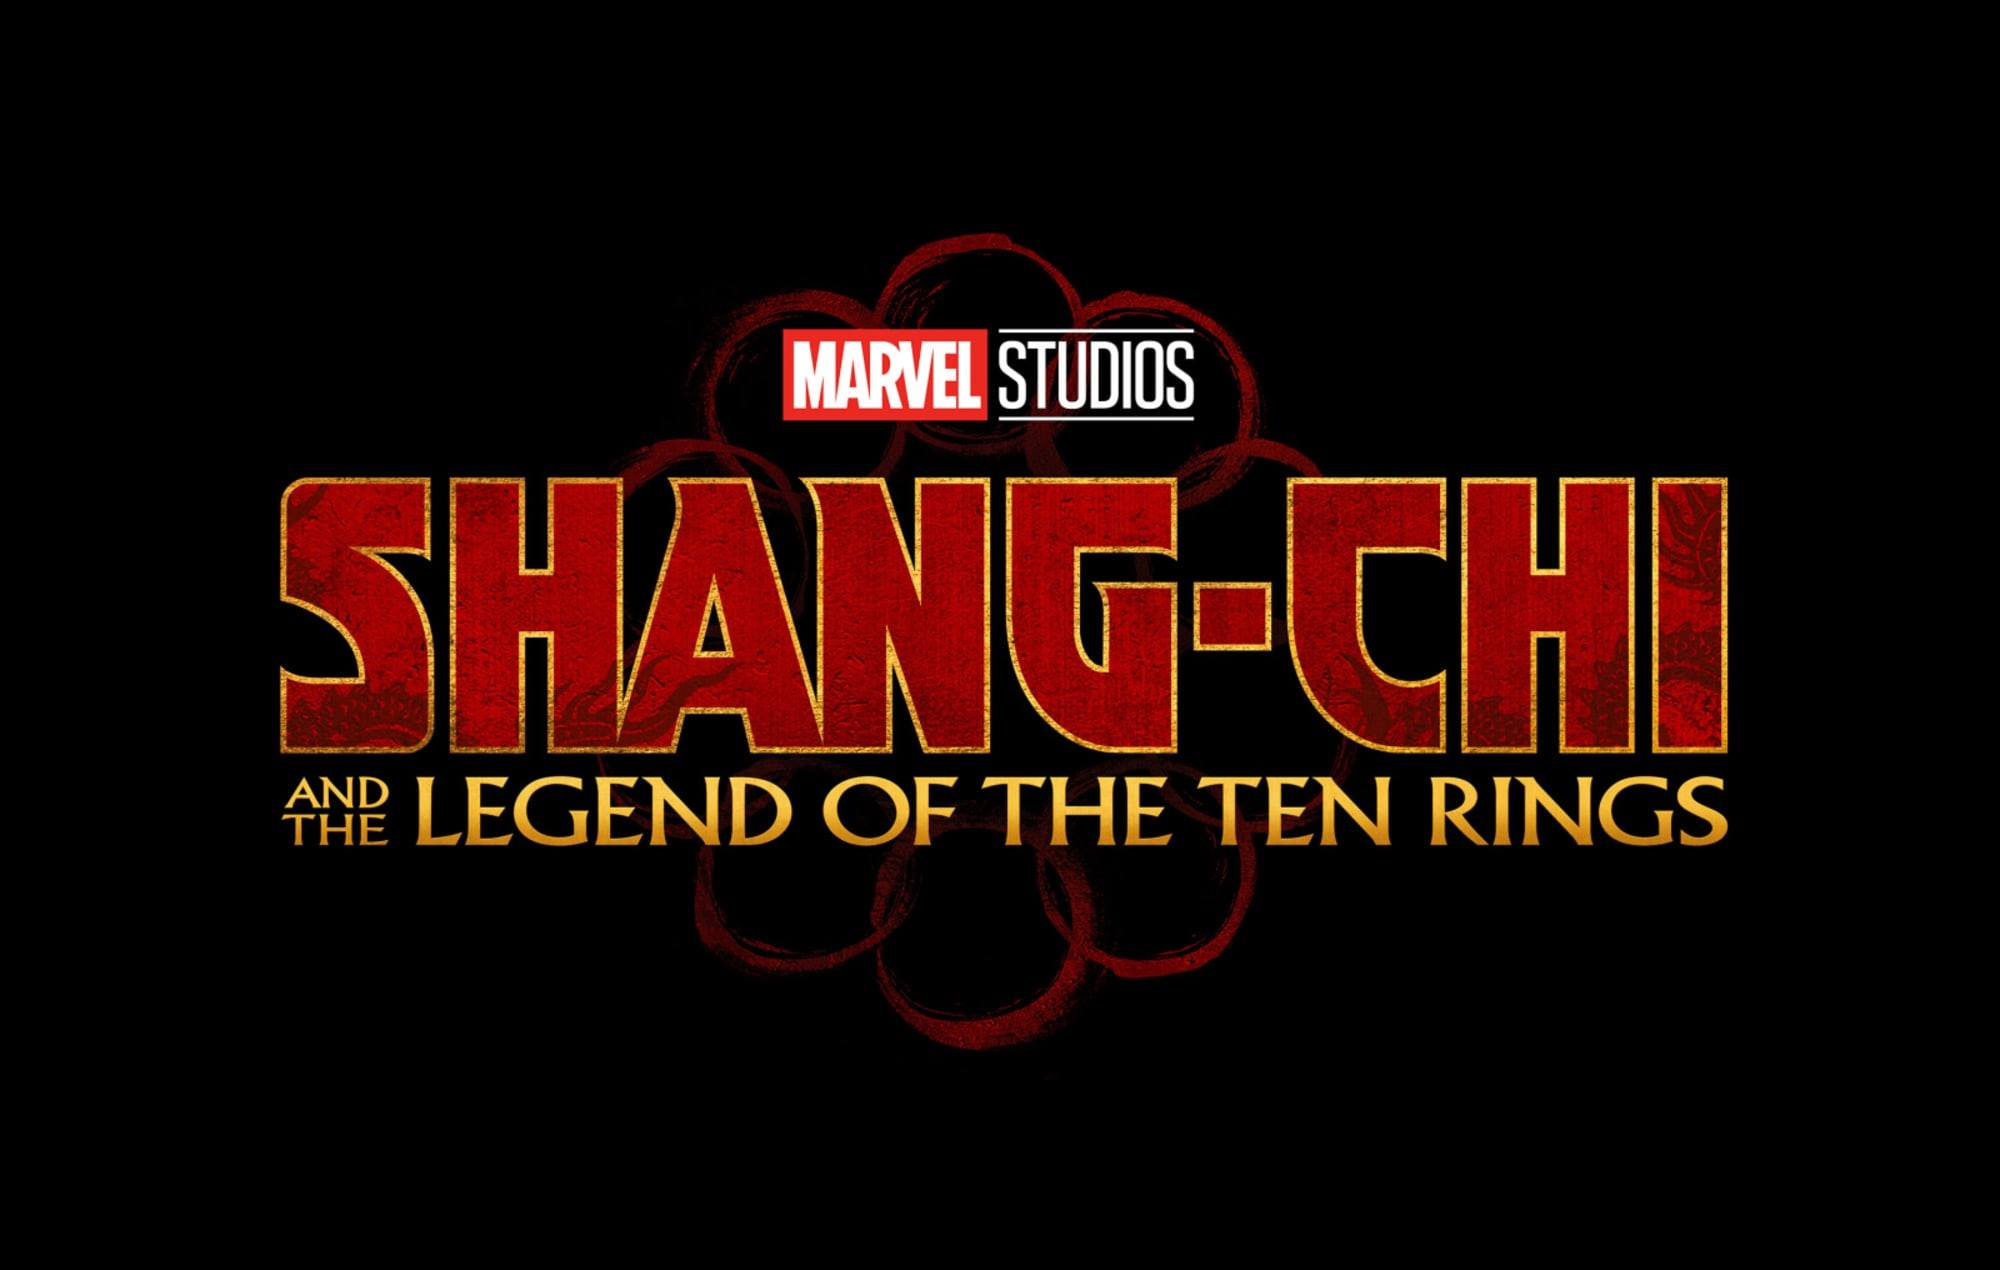 Michael Bane's review of Shang-Chi